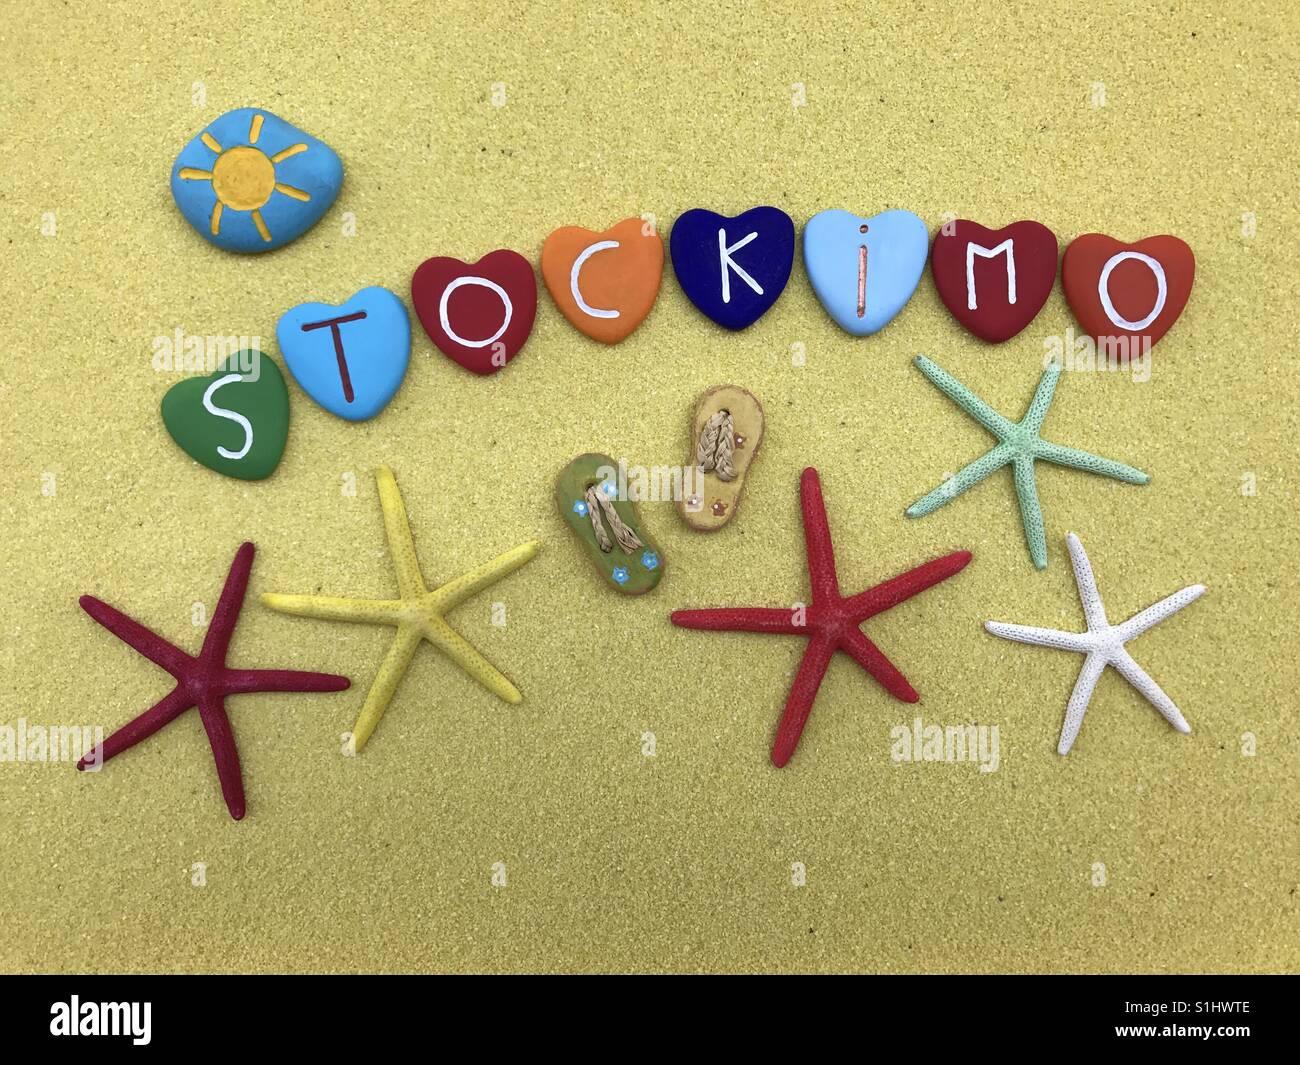 Stockimo Foto Stock